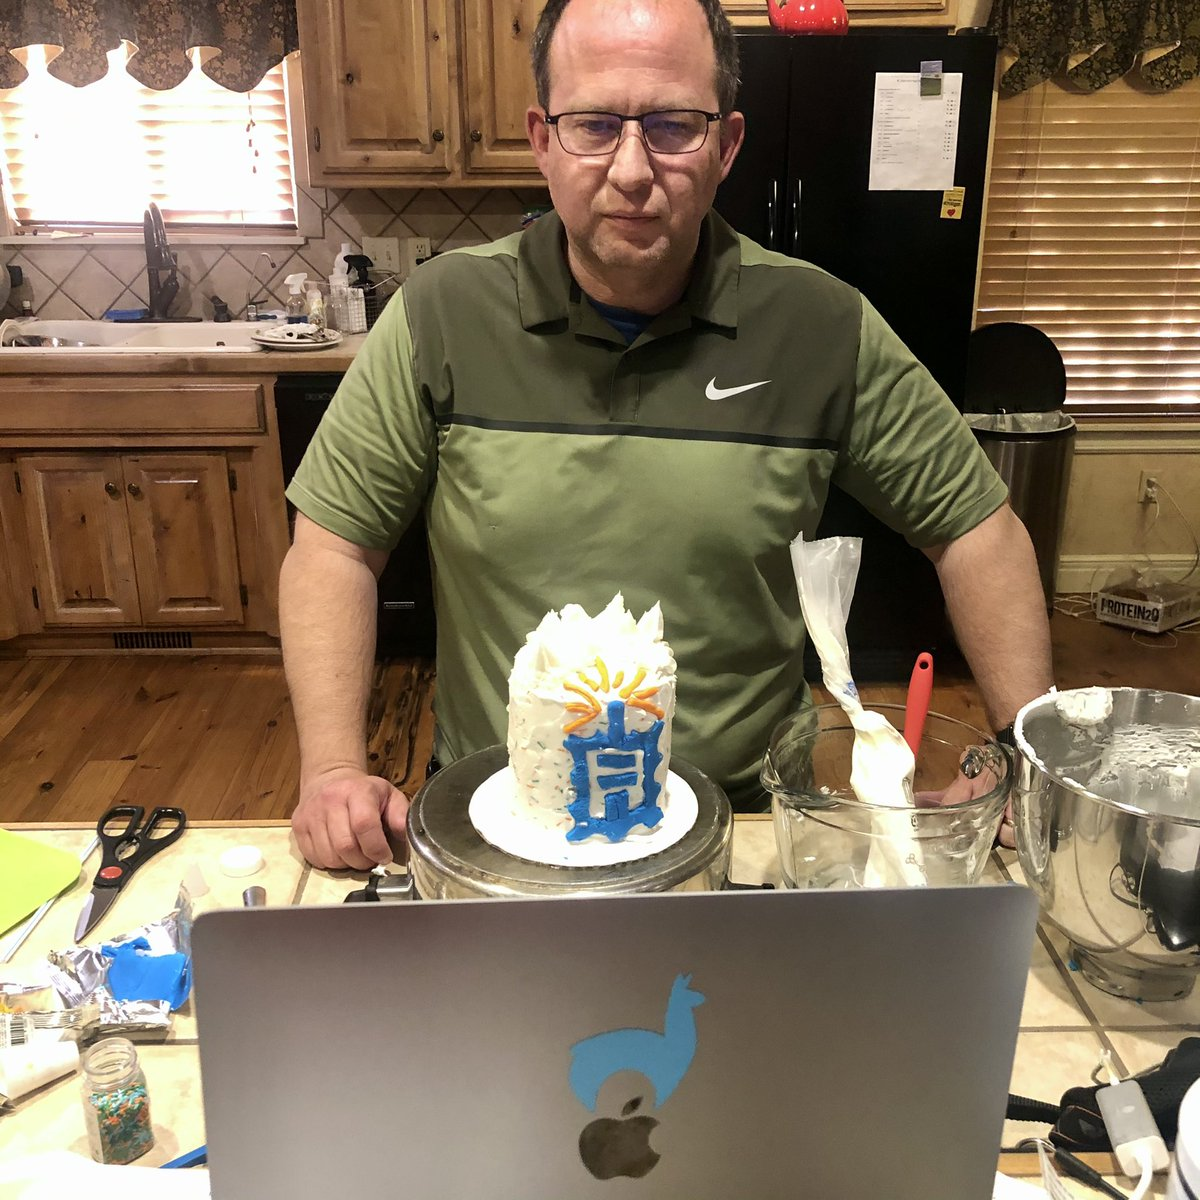 pebisch: #shippingcakes @ShipperHQ @ShipStation Fun hangout e-commerce friends before #AdobeSummit @classyllama #nailedit https://t.co/XAE4FPaAWr